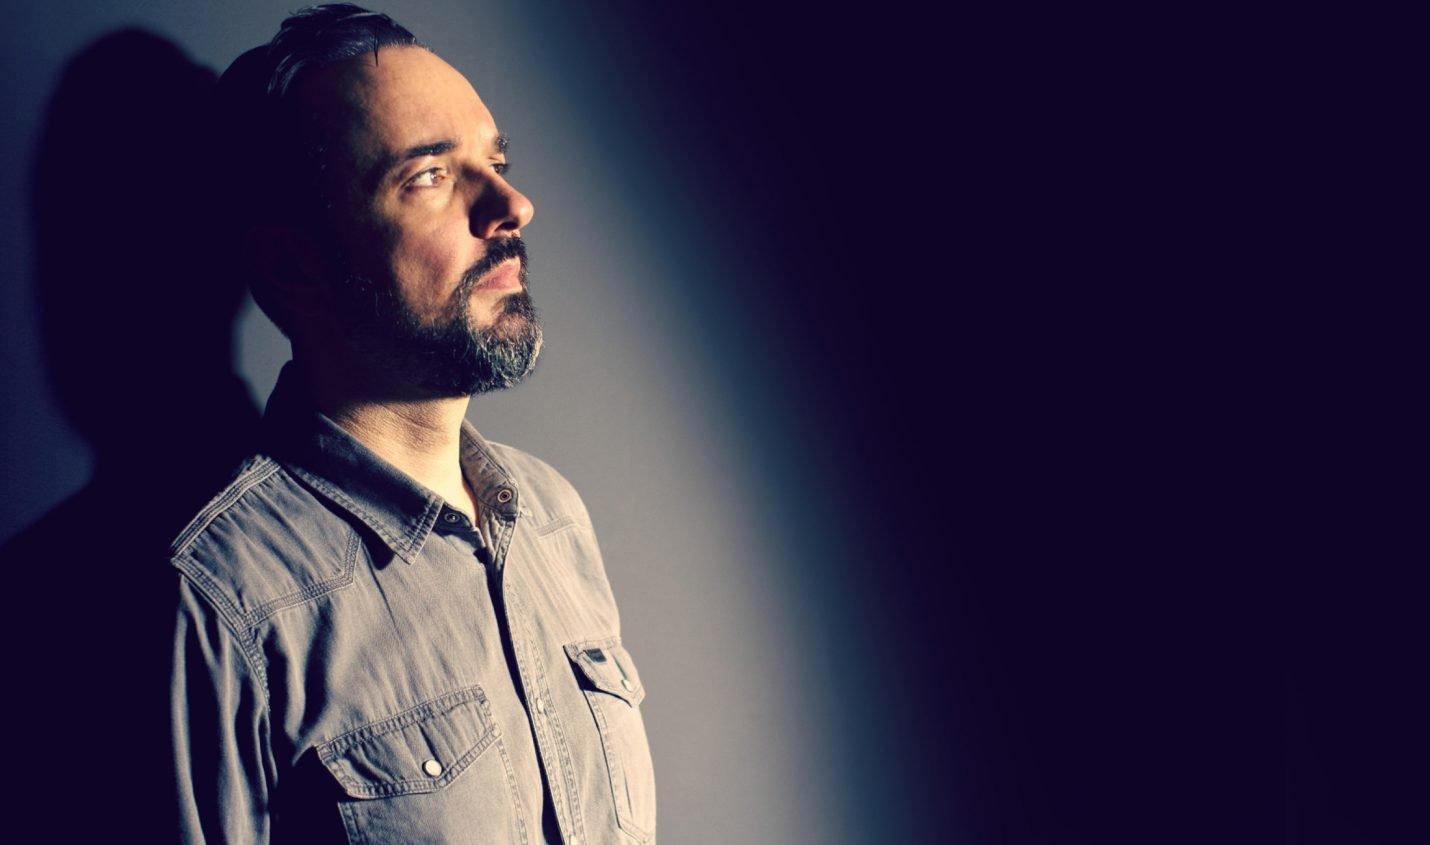 Einblicke ins Produzieren: Marc Romboy